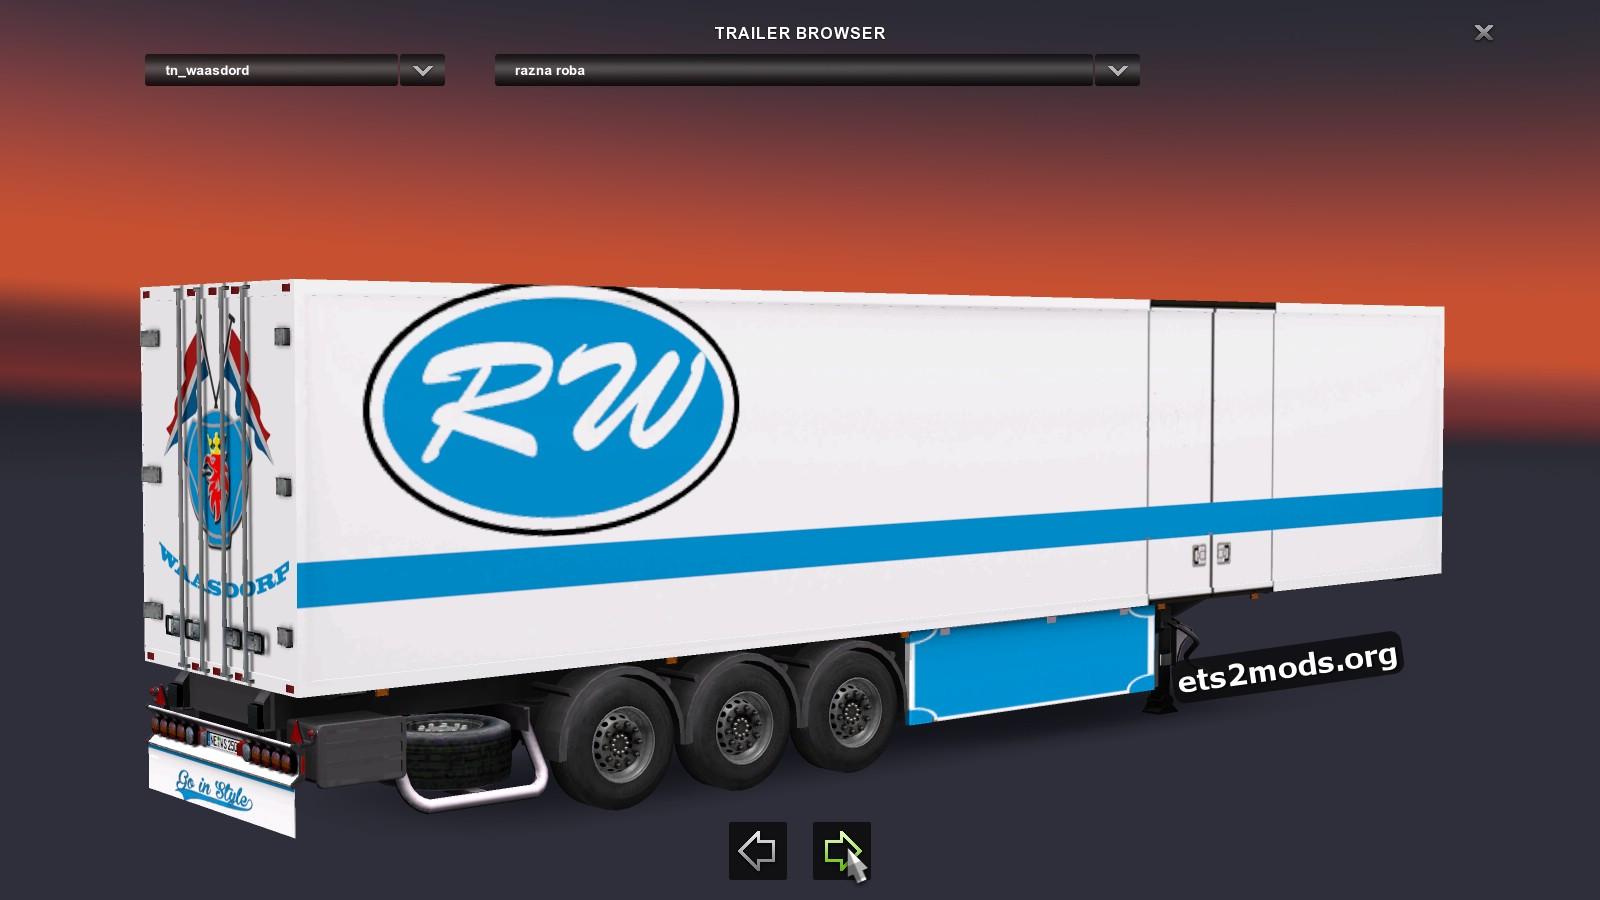 Combo Pack Waasdrorp